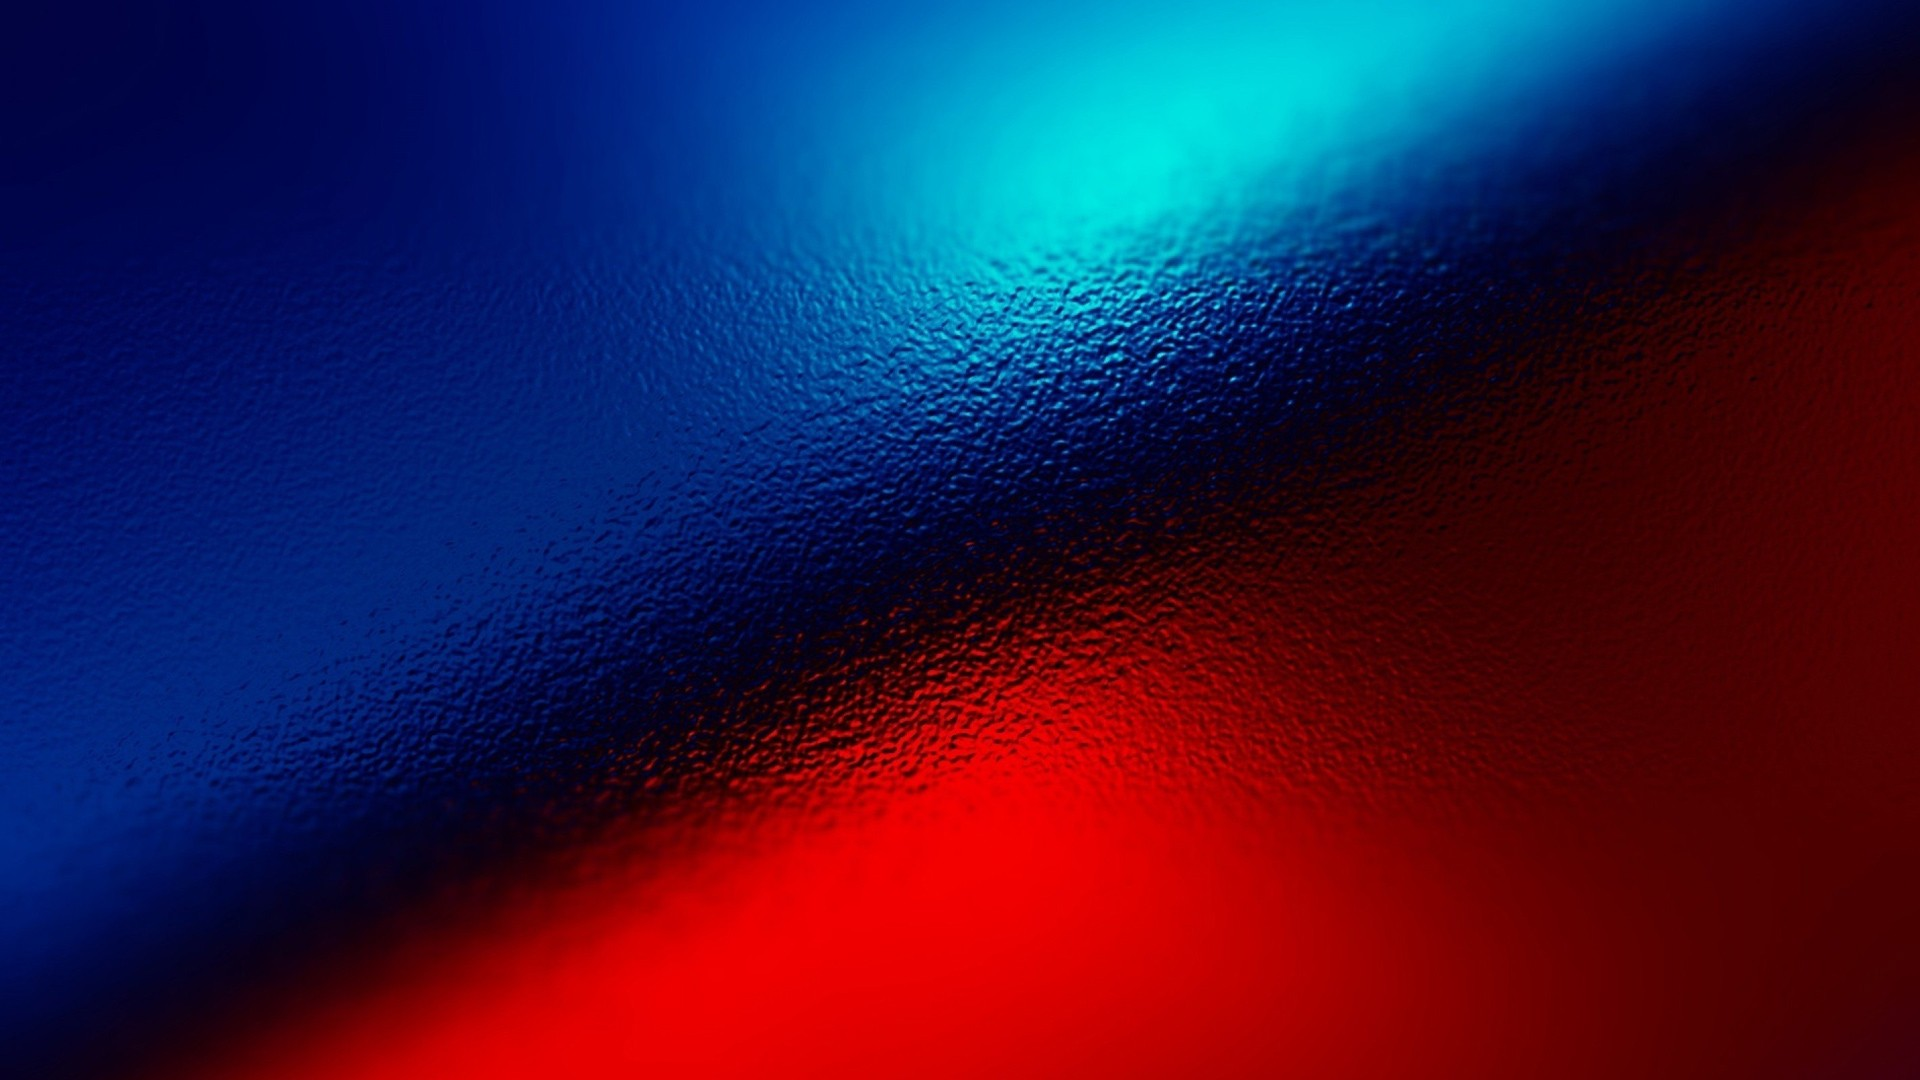 Translucent wallpaper image